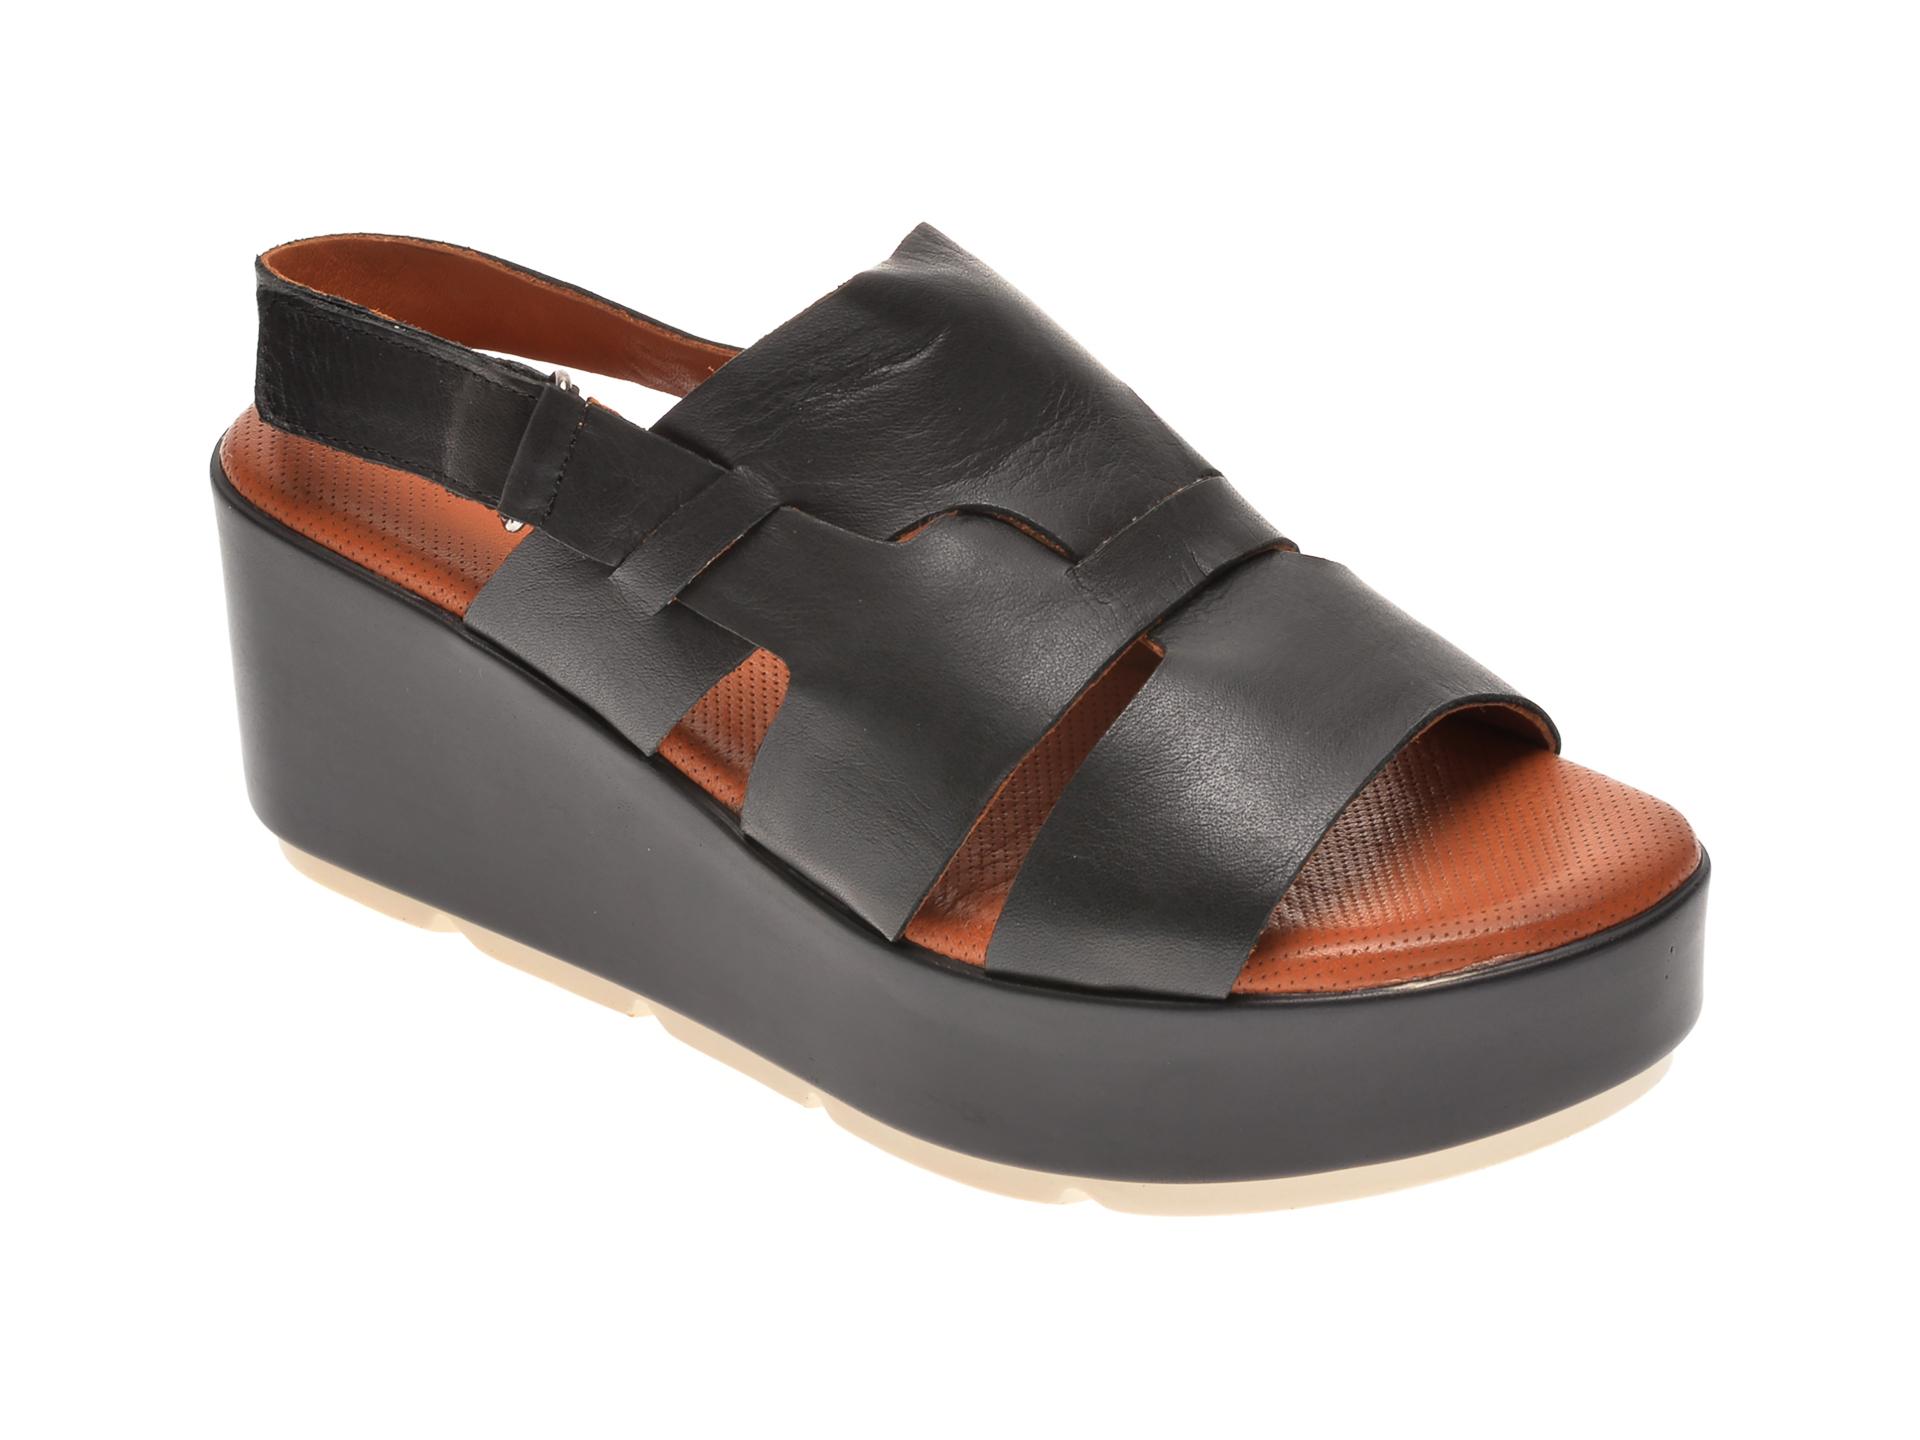 Sandale BABOOS negre, 2519, din piele naturala